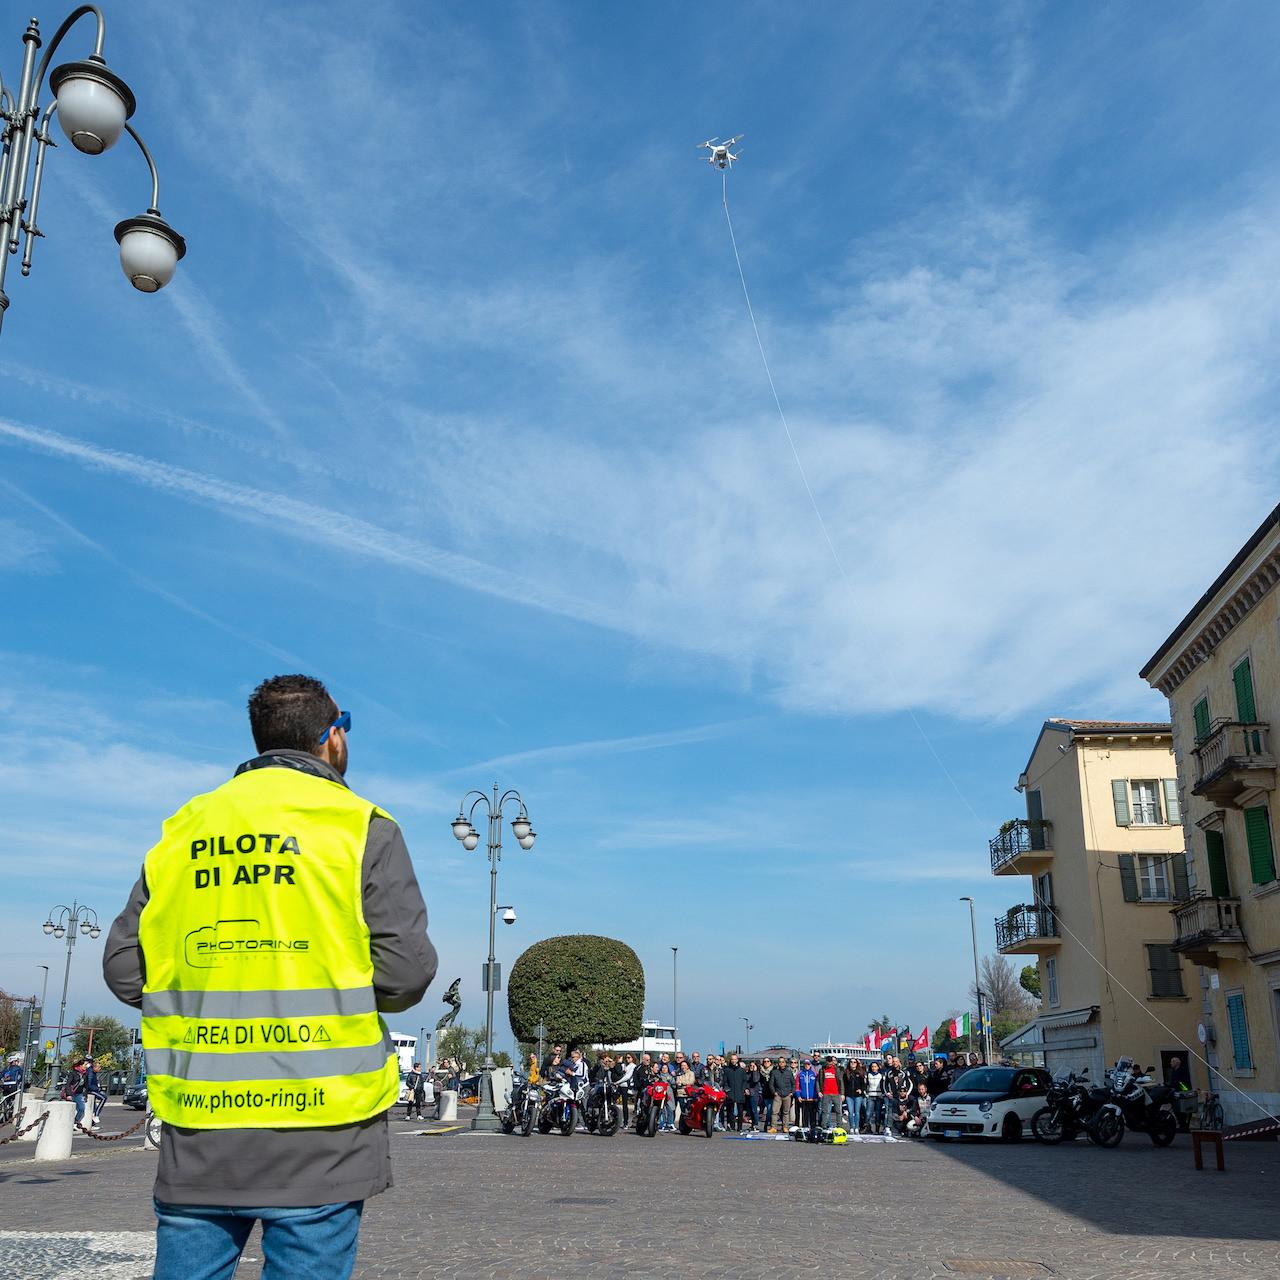 photoring operatore drone enac